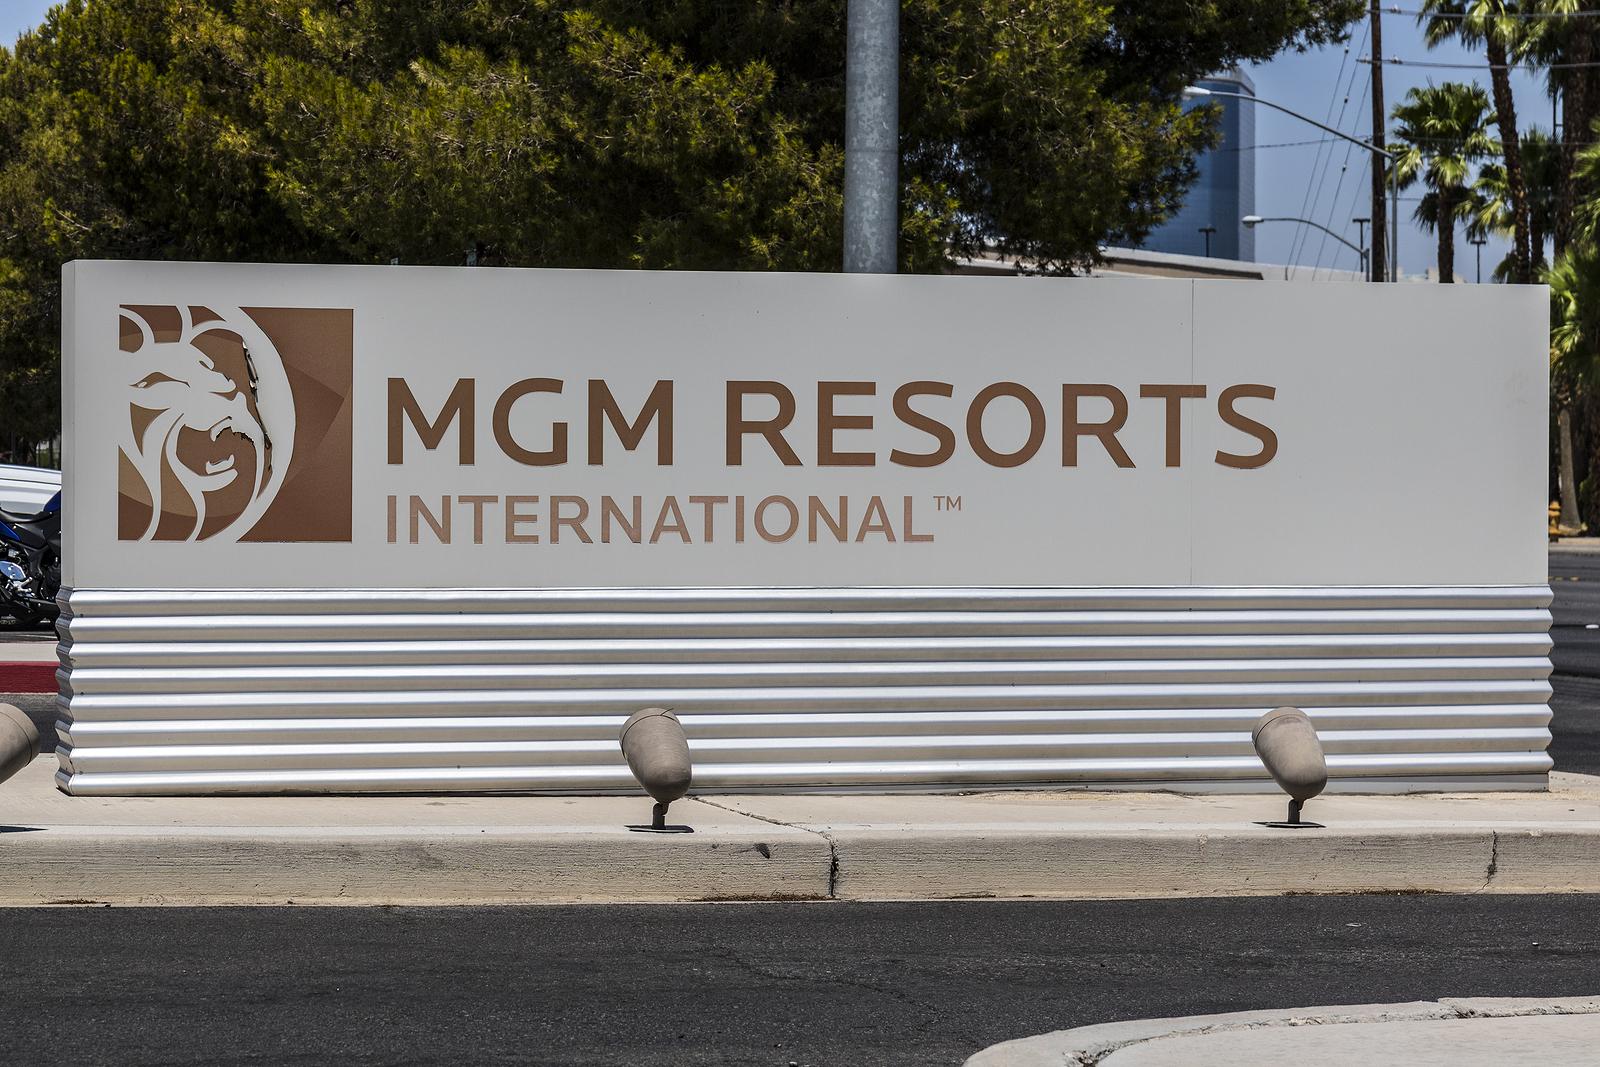 MGM stock, MGM international stock, MGM resorts stock